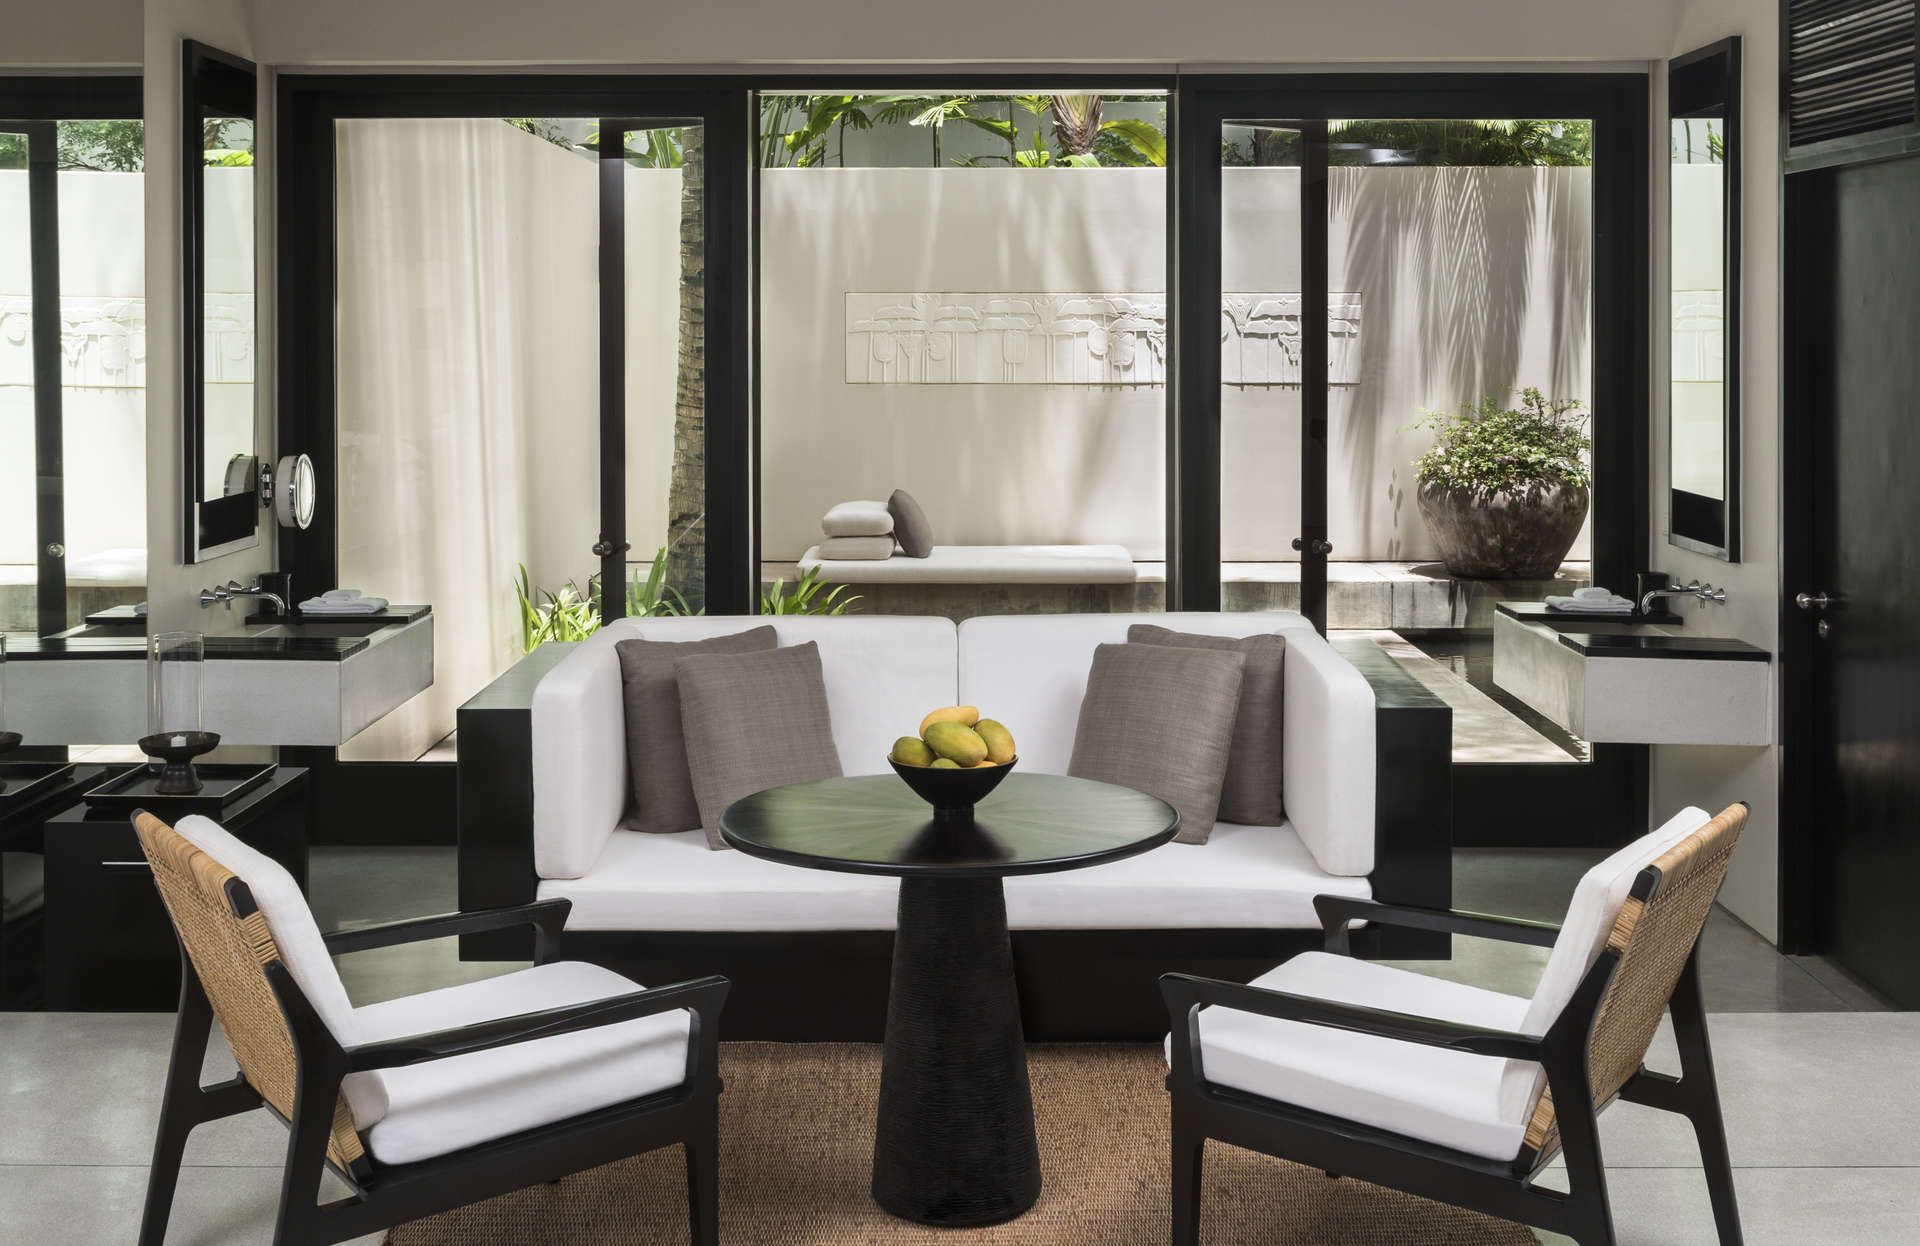 - Courtyard Suite | Amansara - Image 1/8